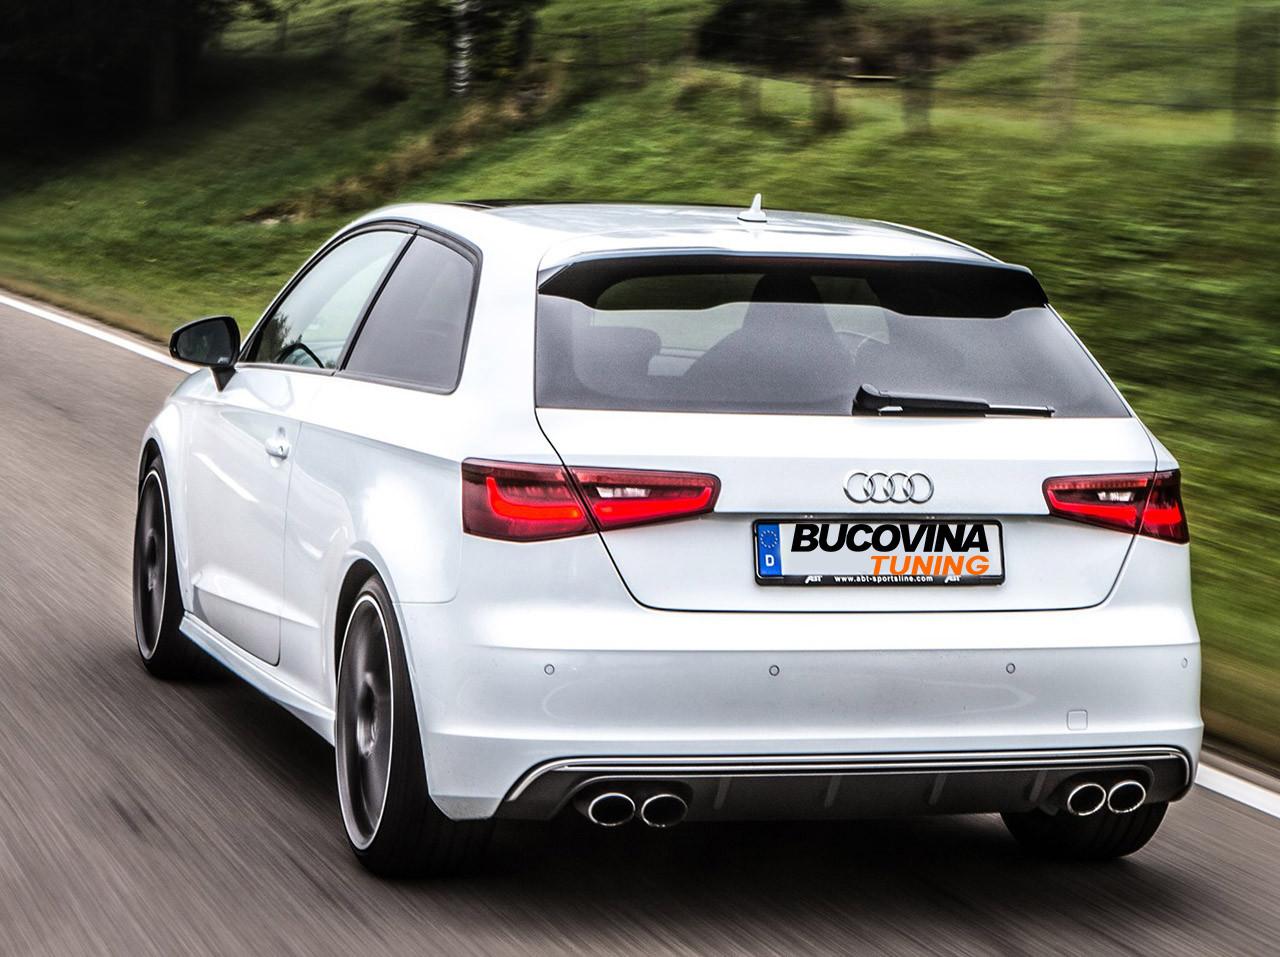 Difuzor bara spate si ornamente evacuare Audi A3 8V Hatchback Sportback (12-15) S3 Design